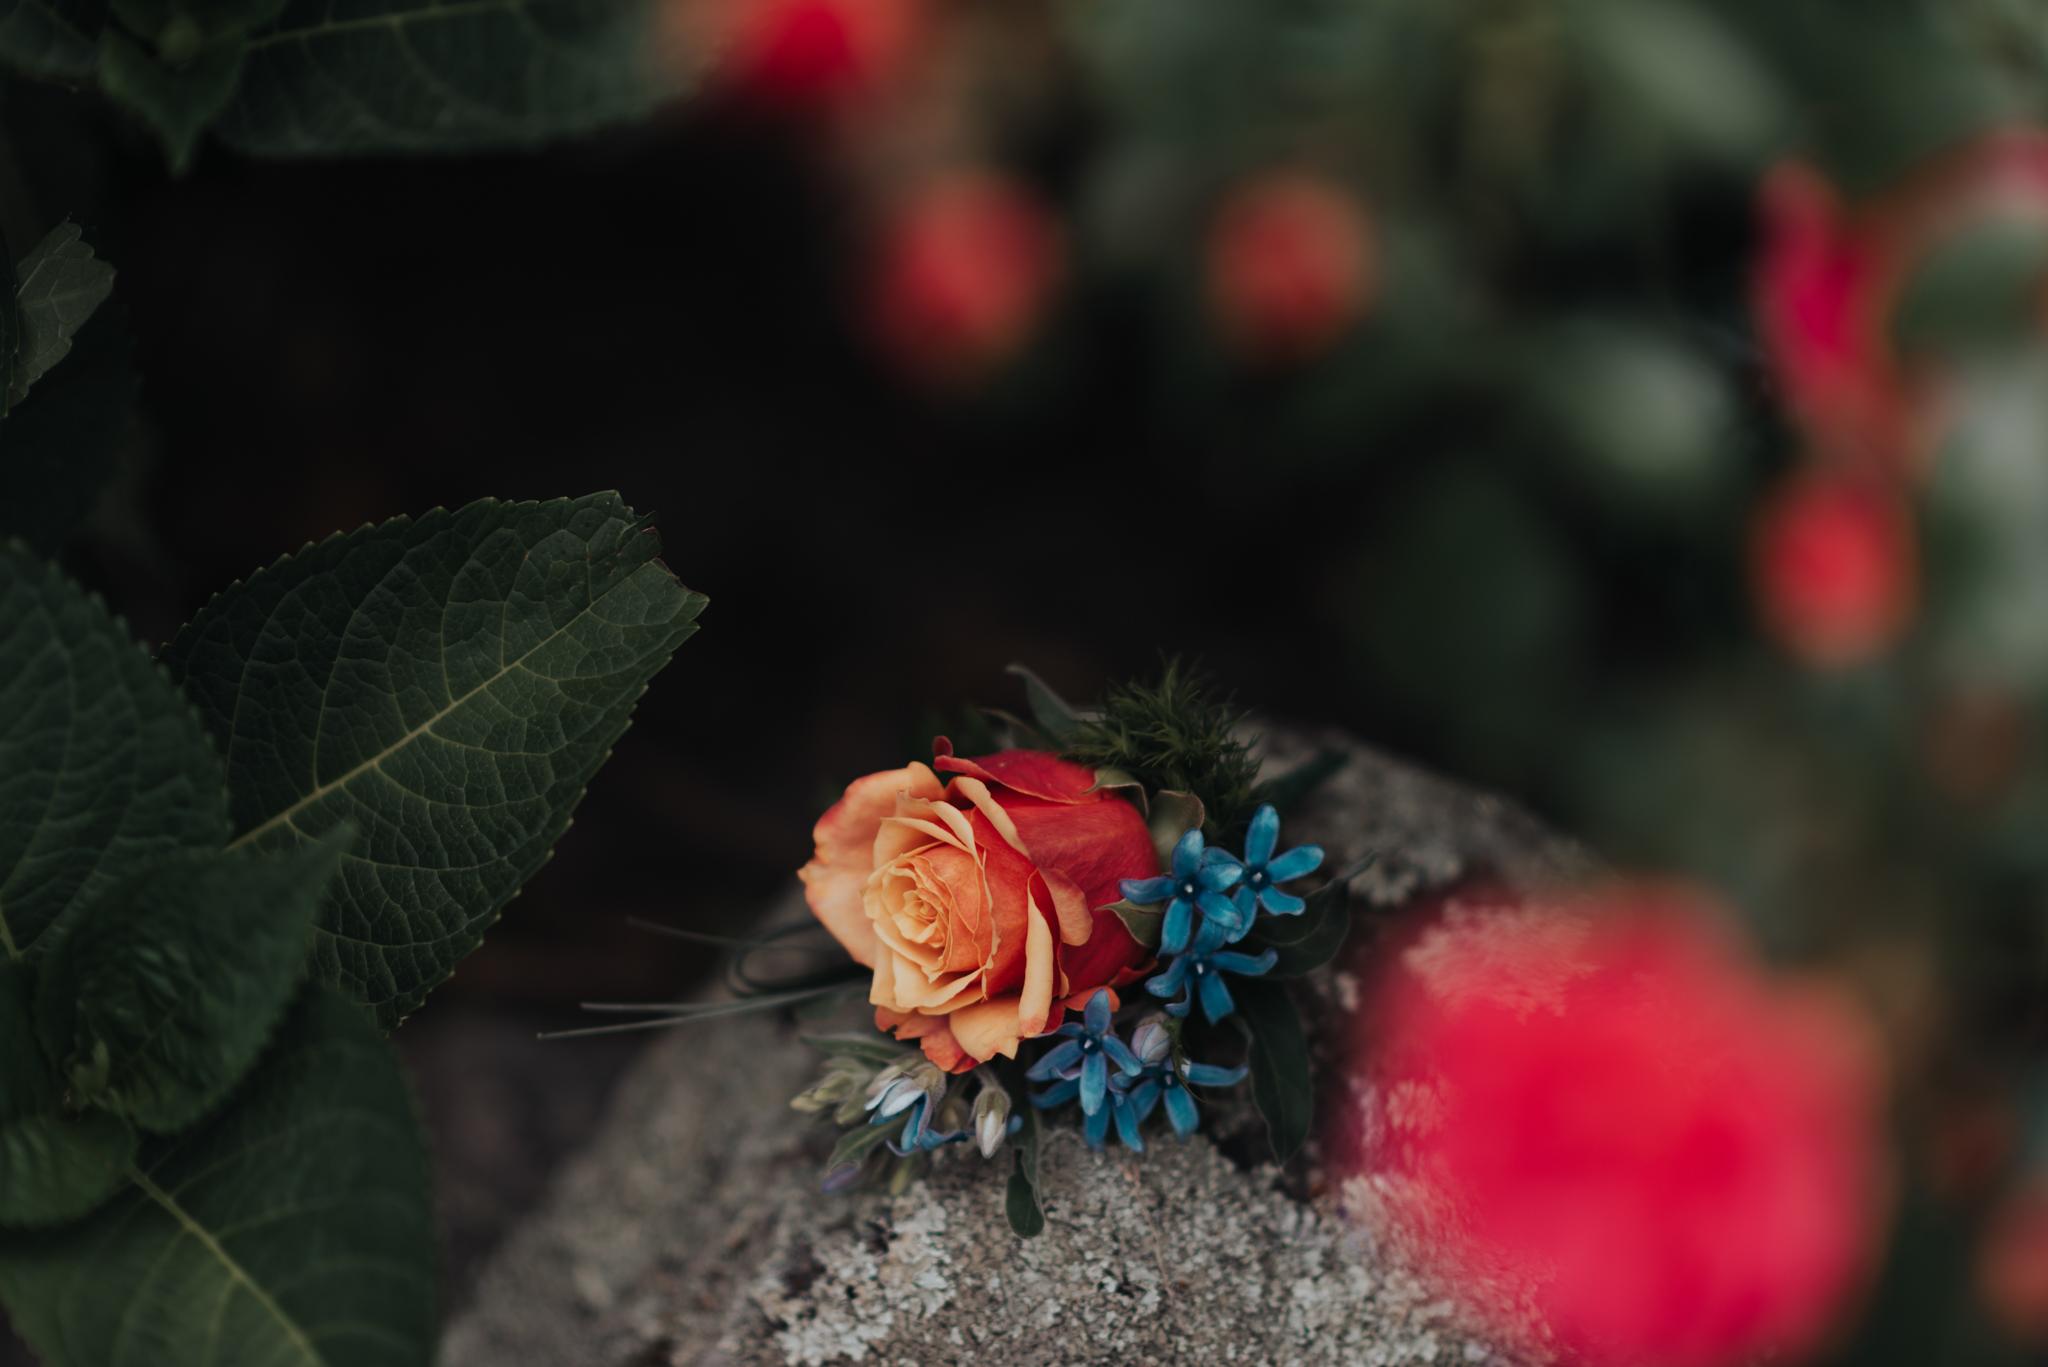 LOVELENSCAPES PHOTOGRAPHY • VISUAL POETRY • NEW ZEALAND WEDDING PHOTOGRAPHER • AUSTRALIAN WEDDING PHOTOGRAPHER • BRISBANE • MELBOURNE • SYDNEY • HOBART • TARUREKA ESTATE • ANNA CAMPBELL • 88.jpg